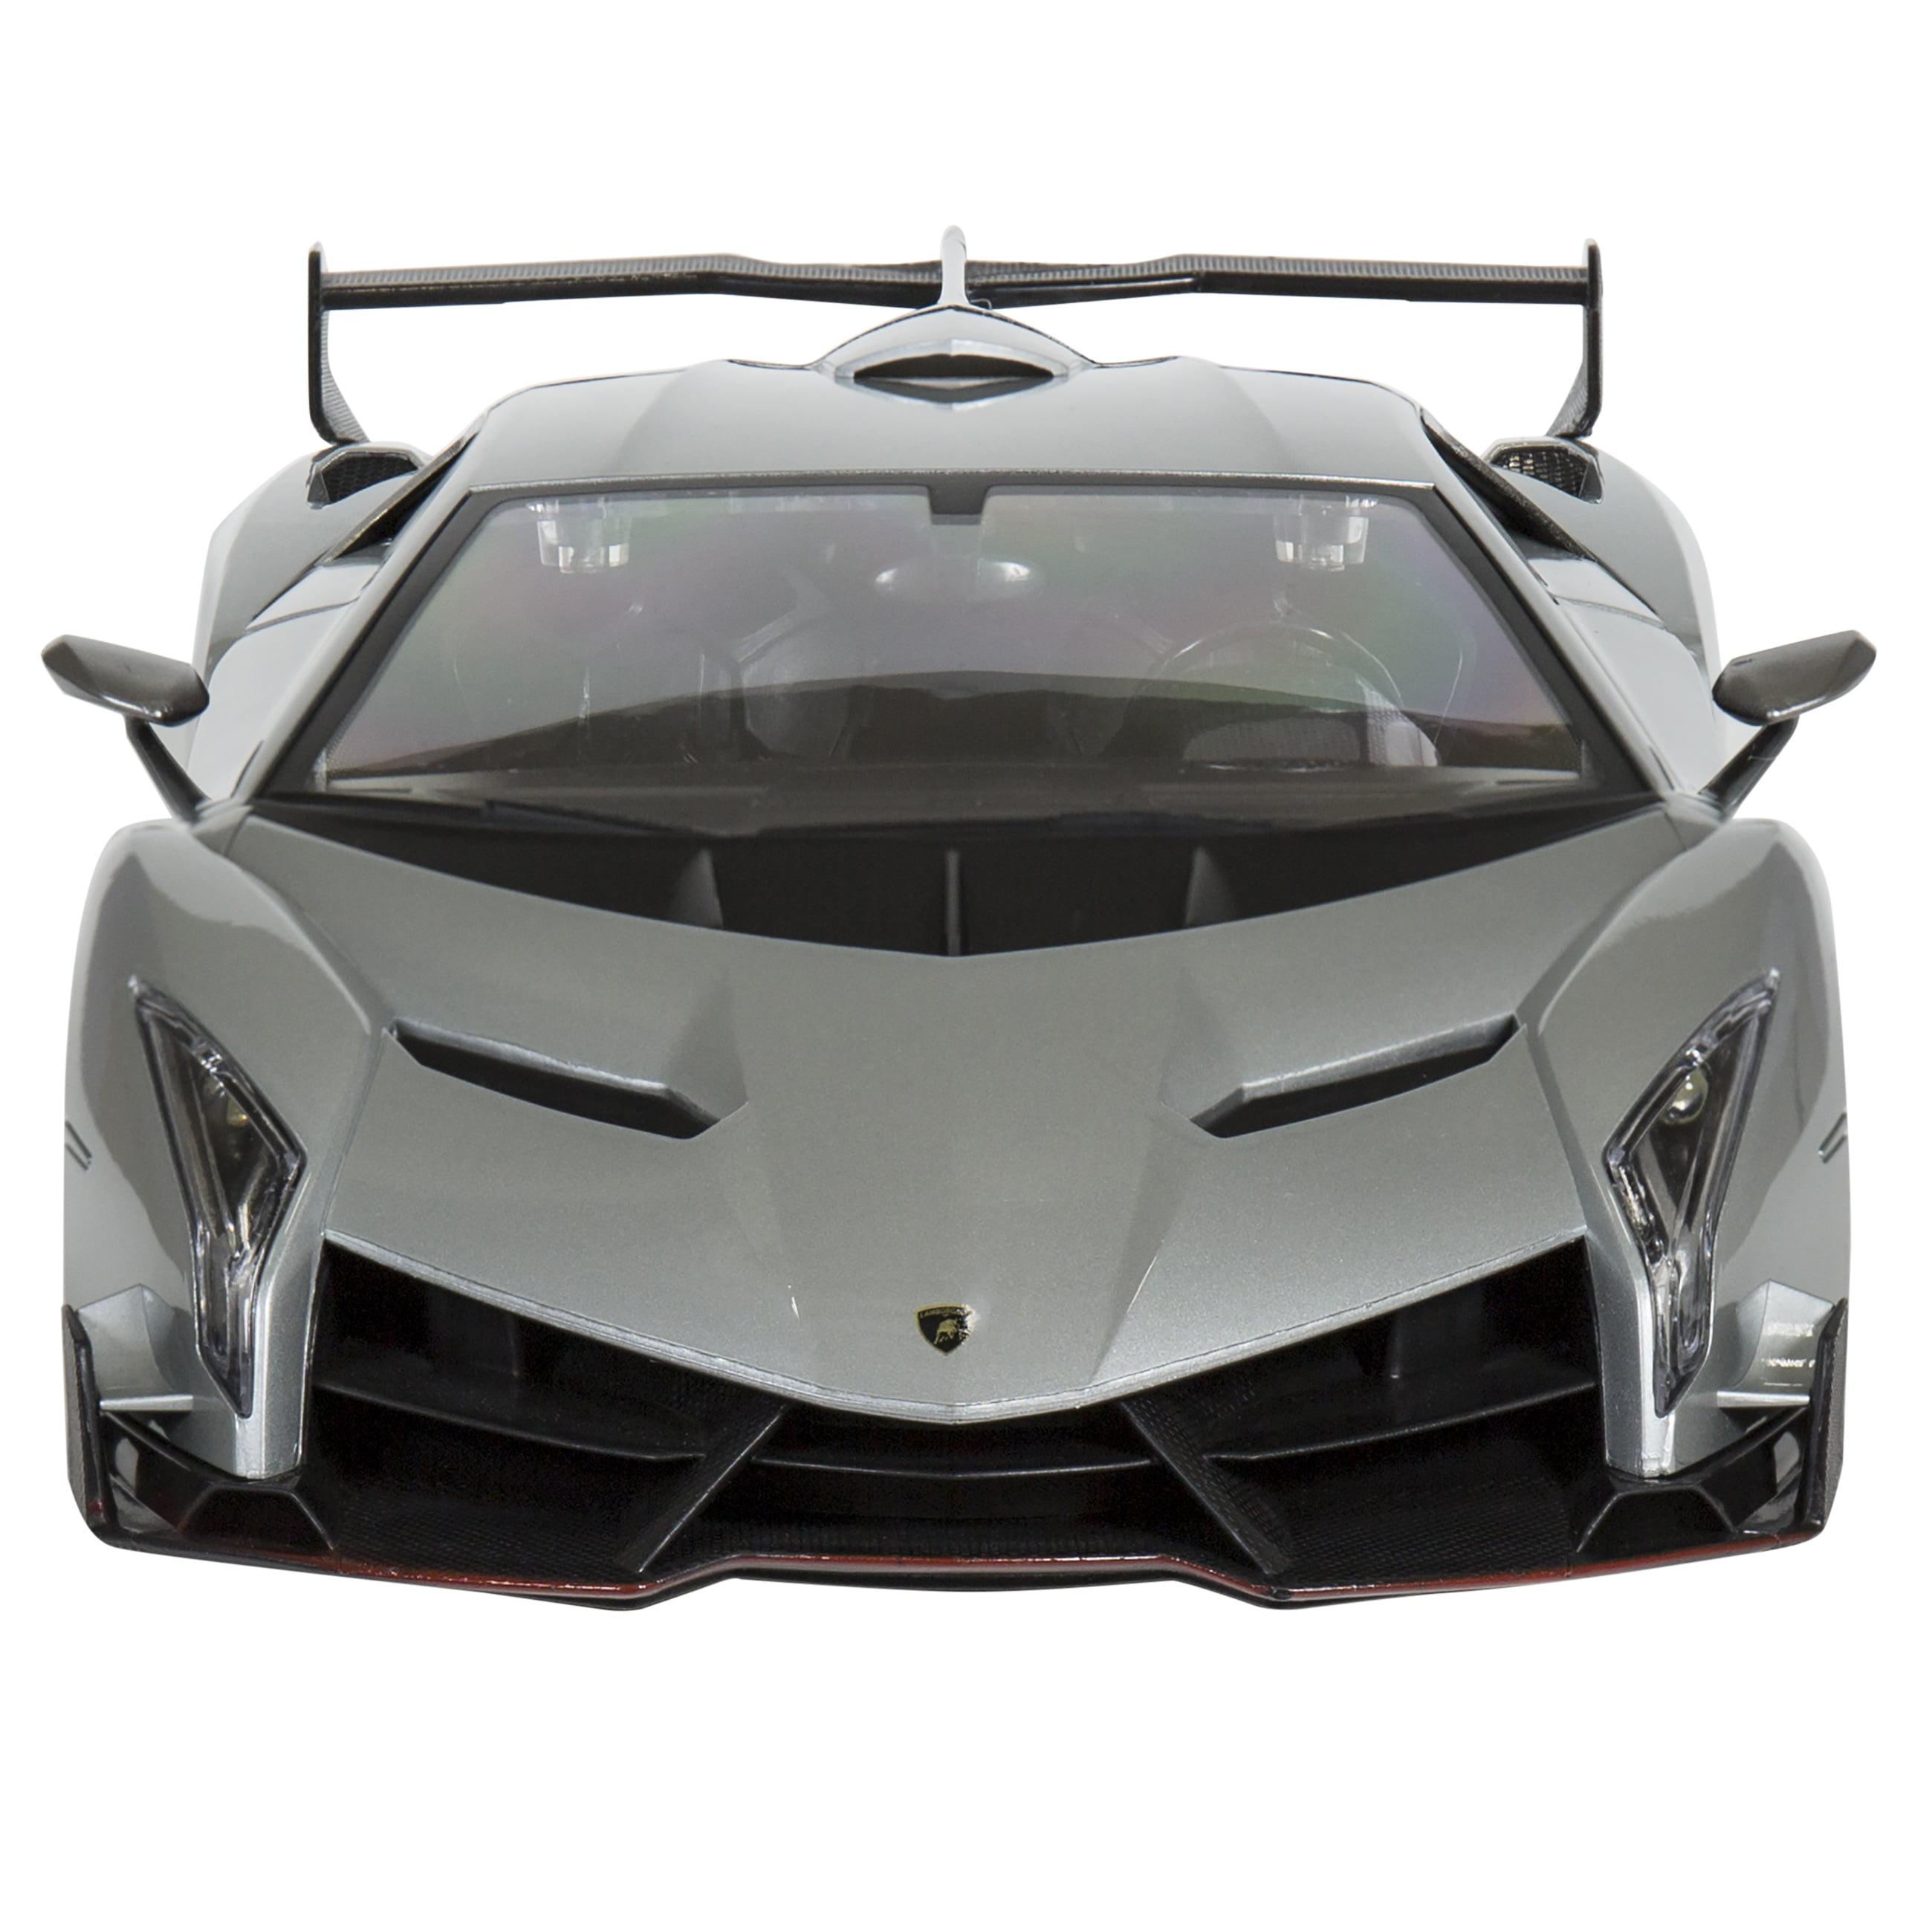 Cars silver racer poster 2 - Best Choice Products 1 14 Scale Rc Lamborghini Veneno Gravity Sensor Radio Remote Control Car Silver Walmart Com